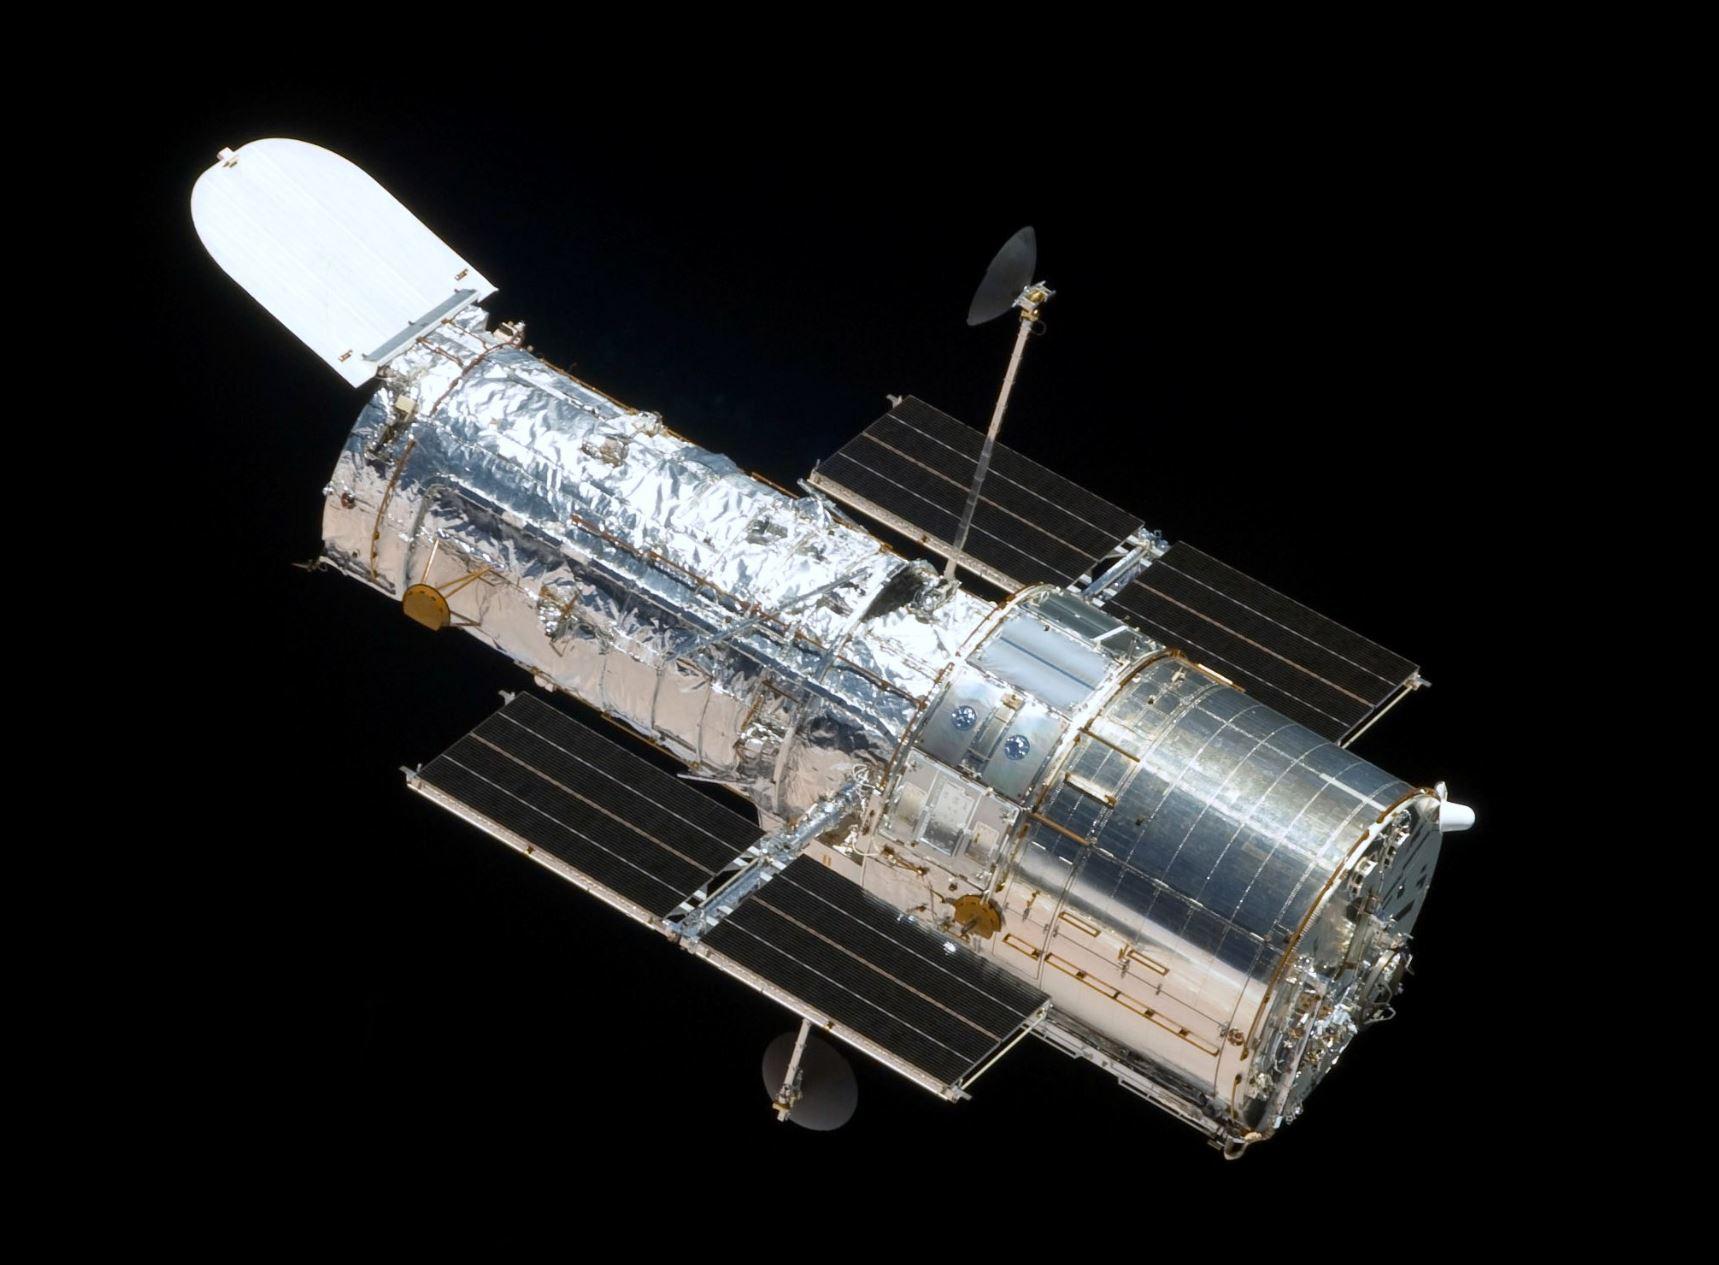 Image Credit:  NASA/Ruffnax (Crew of STS-125) via Wikimedia Commons